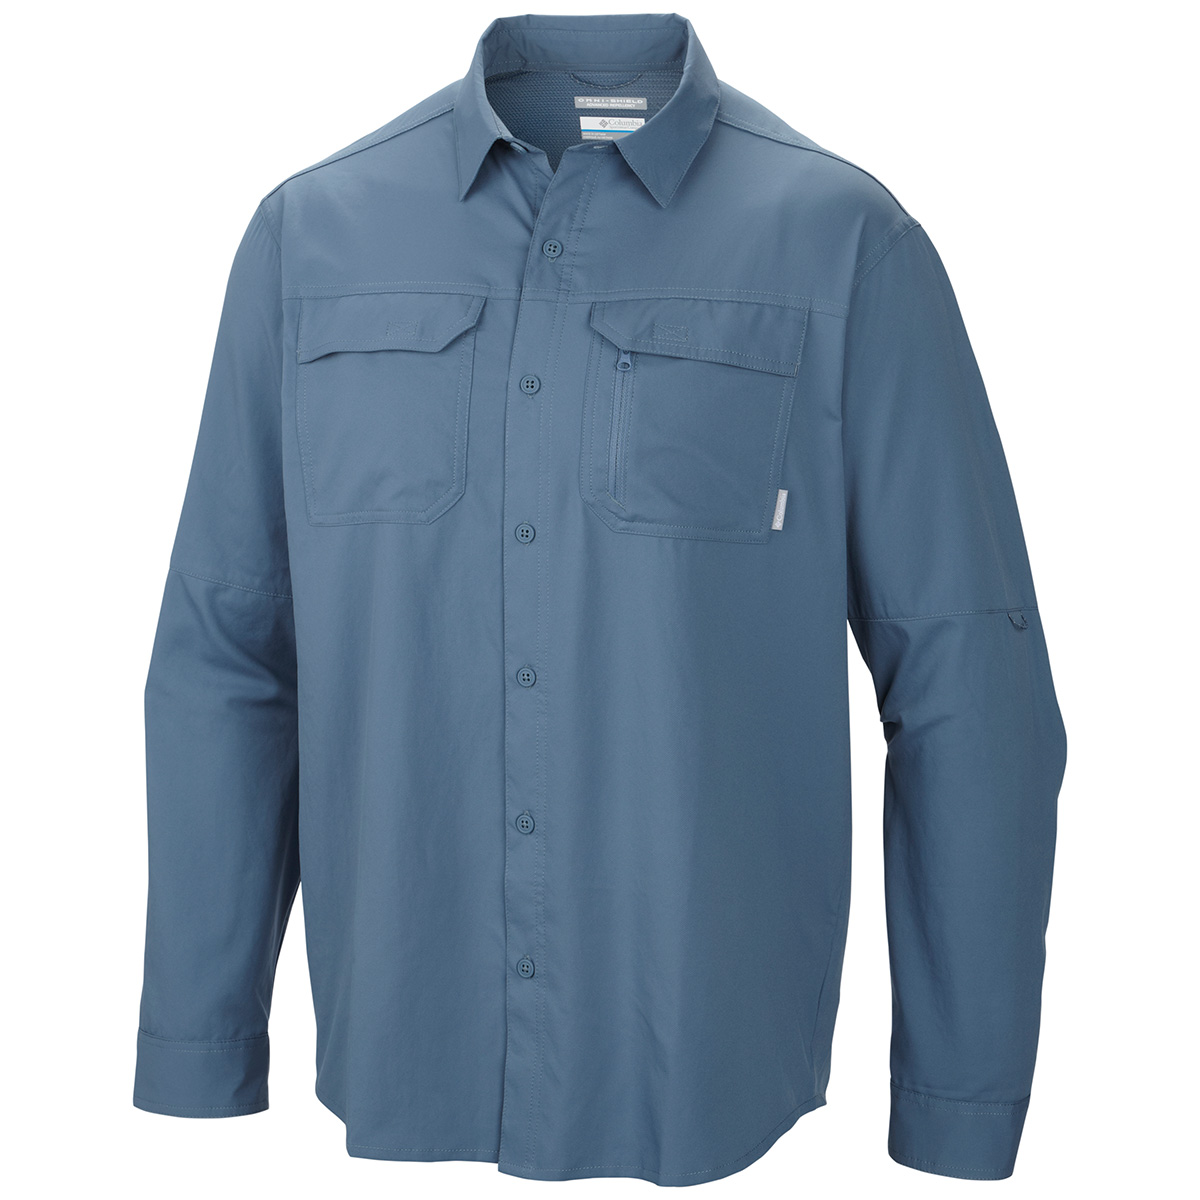 Columbia voyager long sleeve shirt fishing shirts ebay for Fishing long sleeve shirts